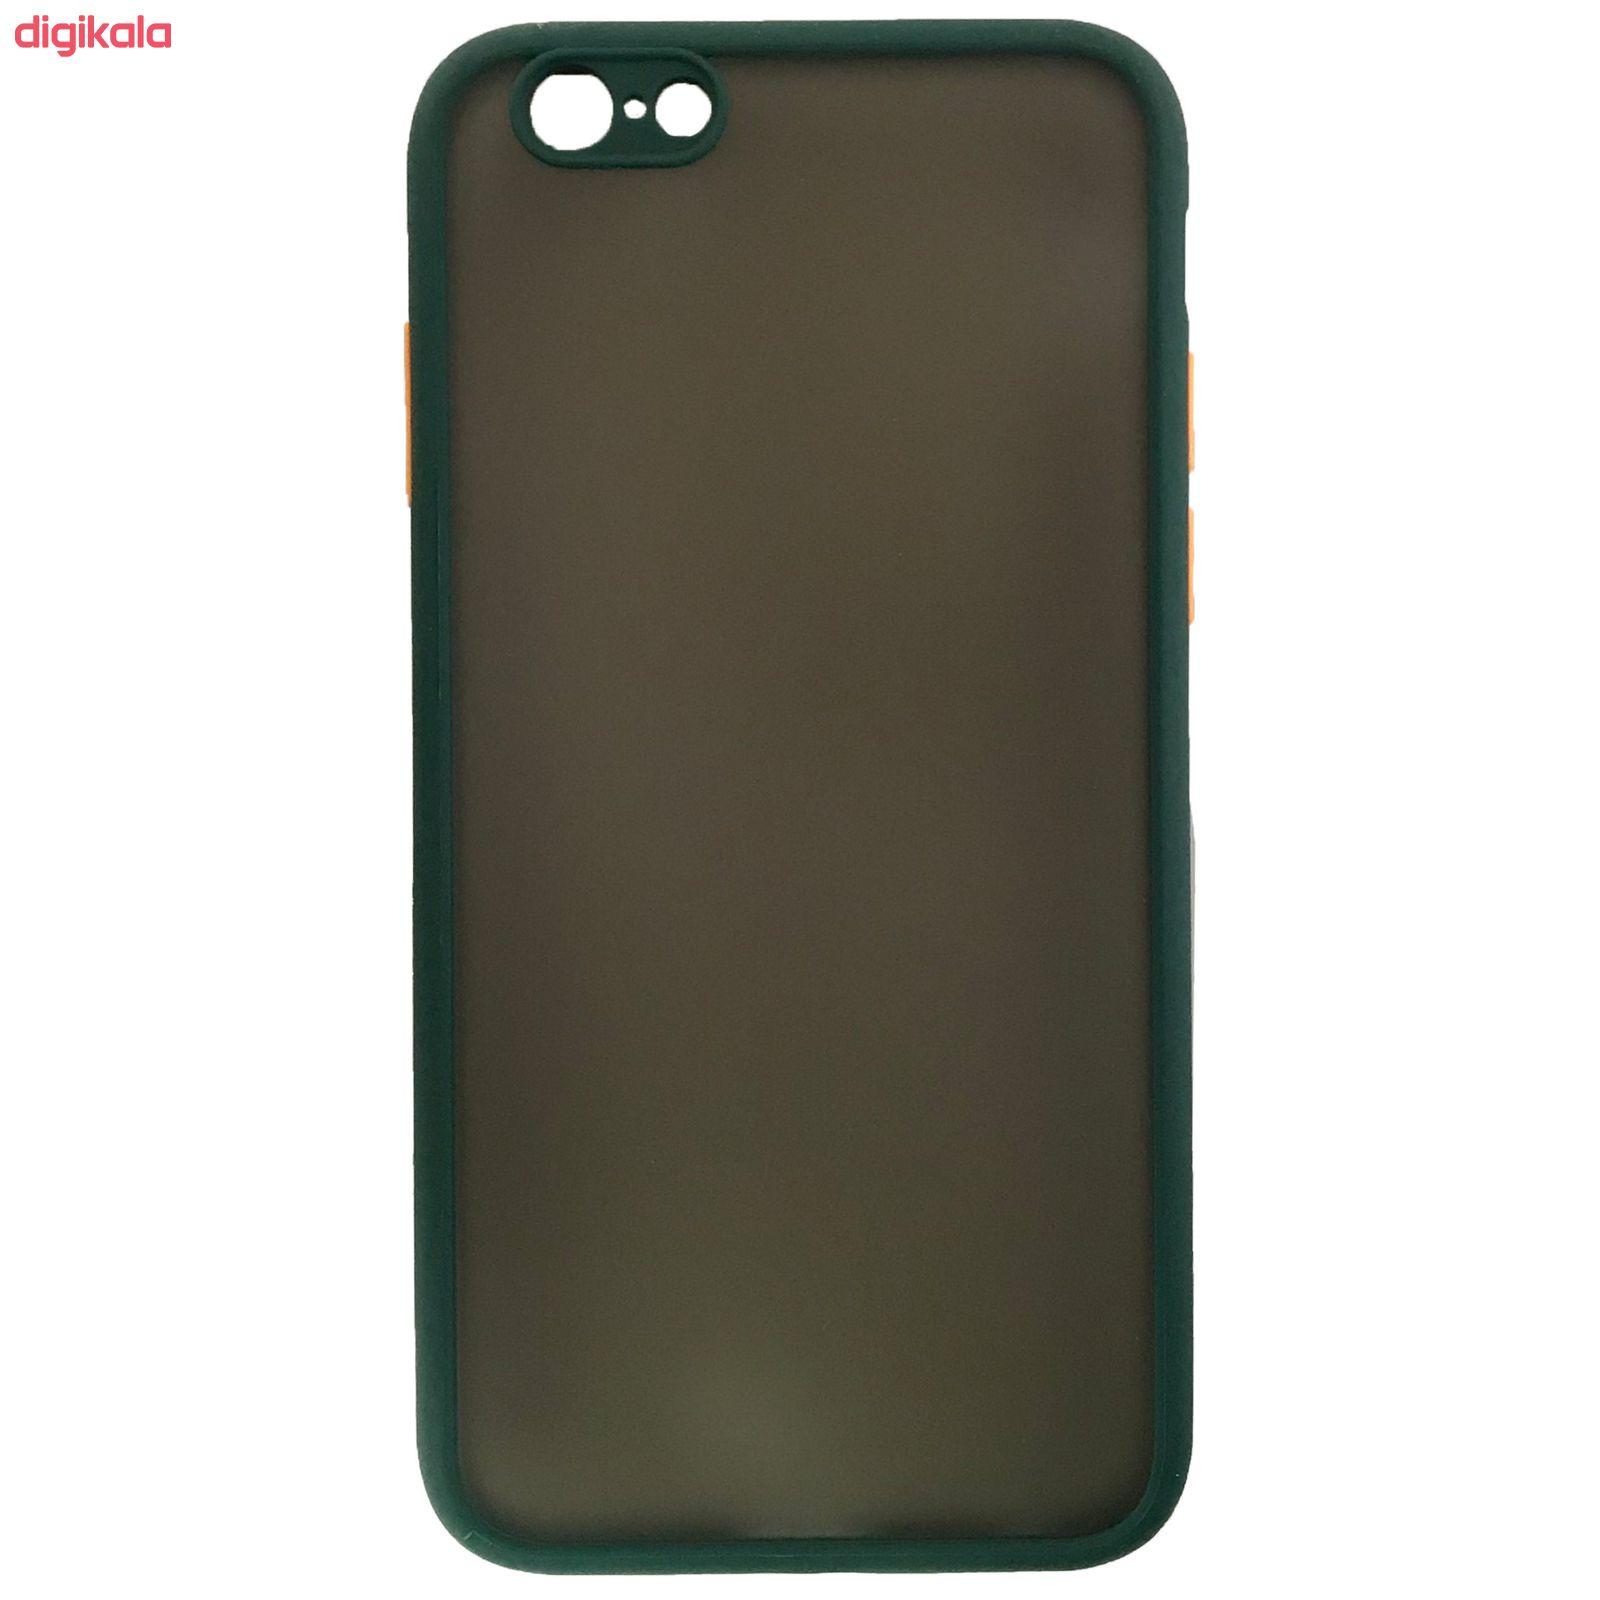 کاور مدل PM-6s مناسب برای گوشی موبایل اپل iPhone 6/6s main 1 3